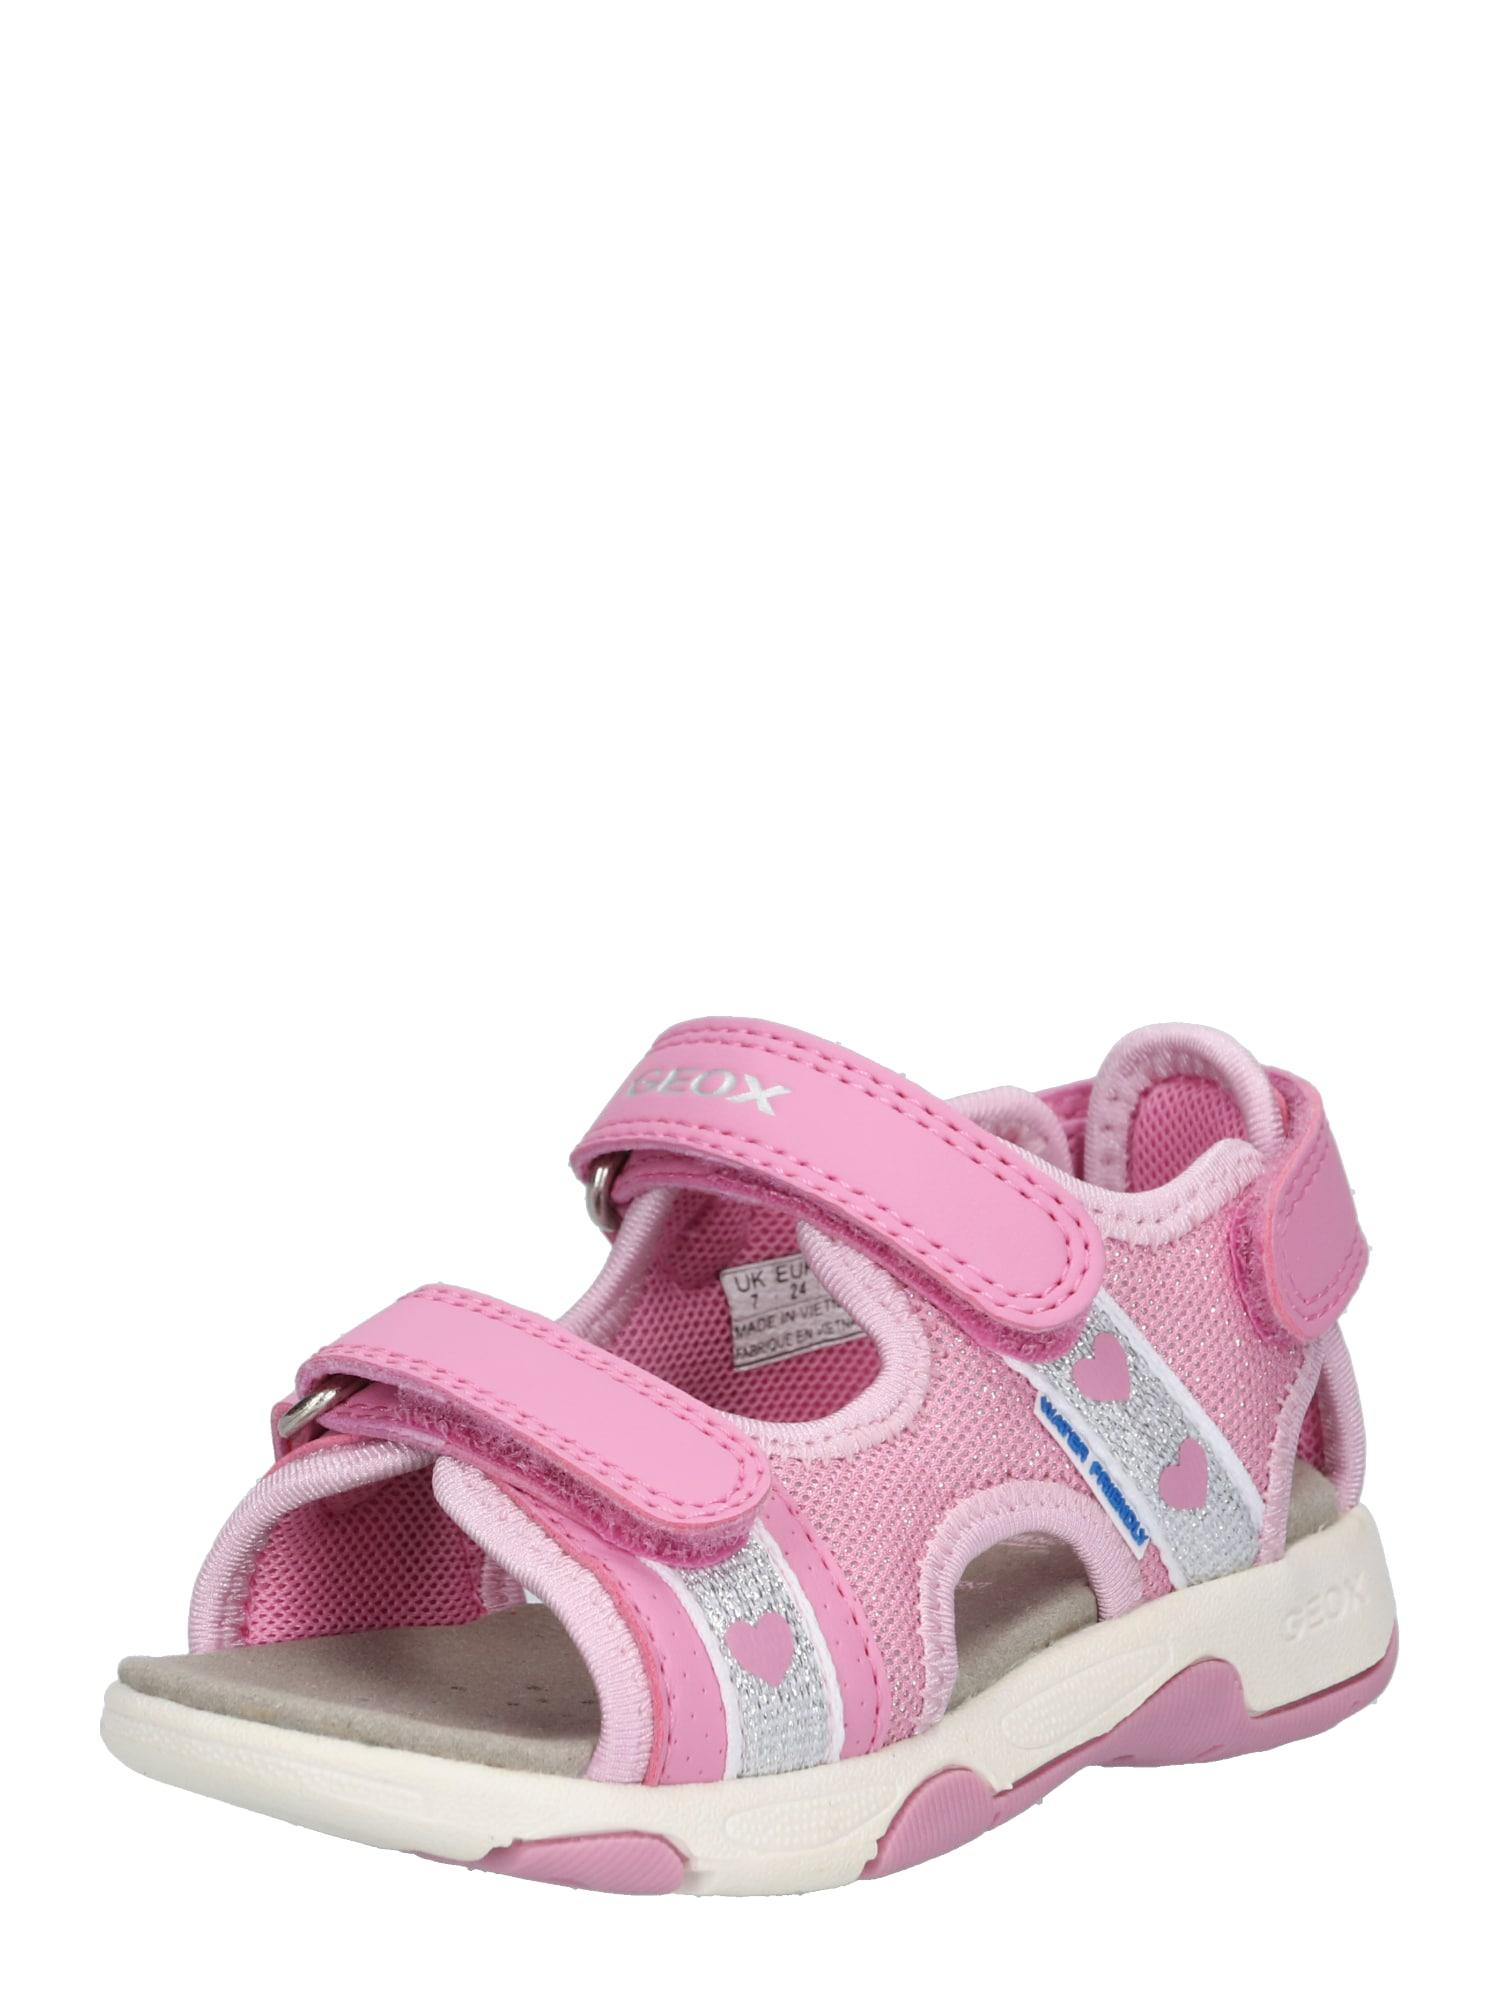 Sandály MULTY růžová bílá GEOX